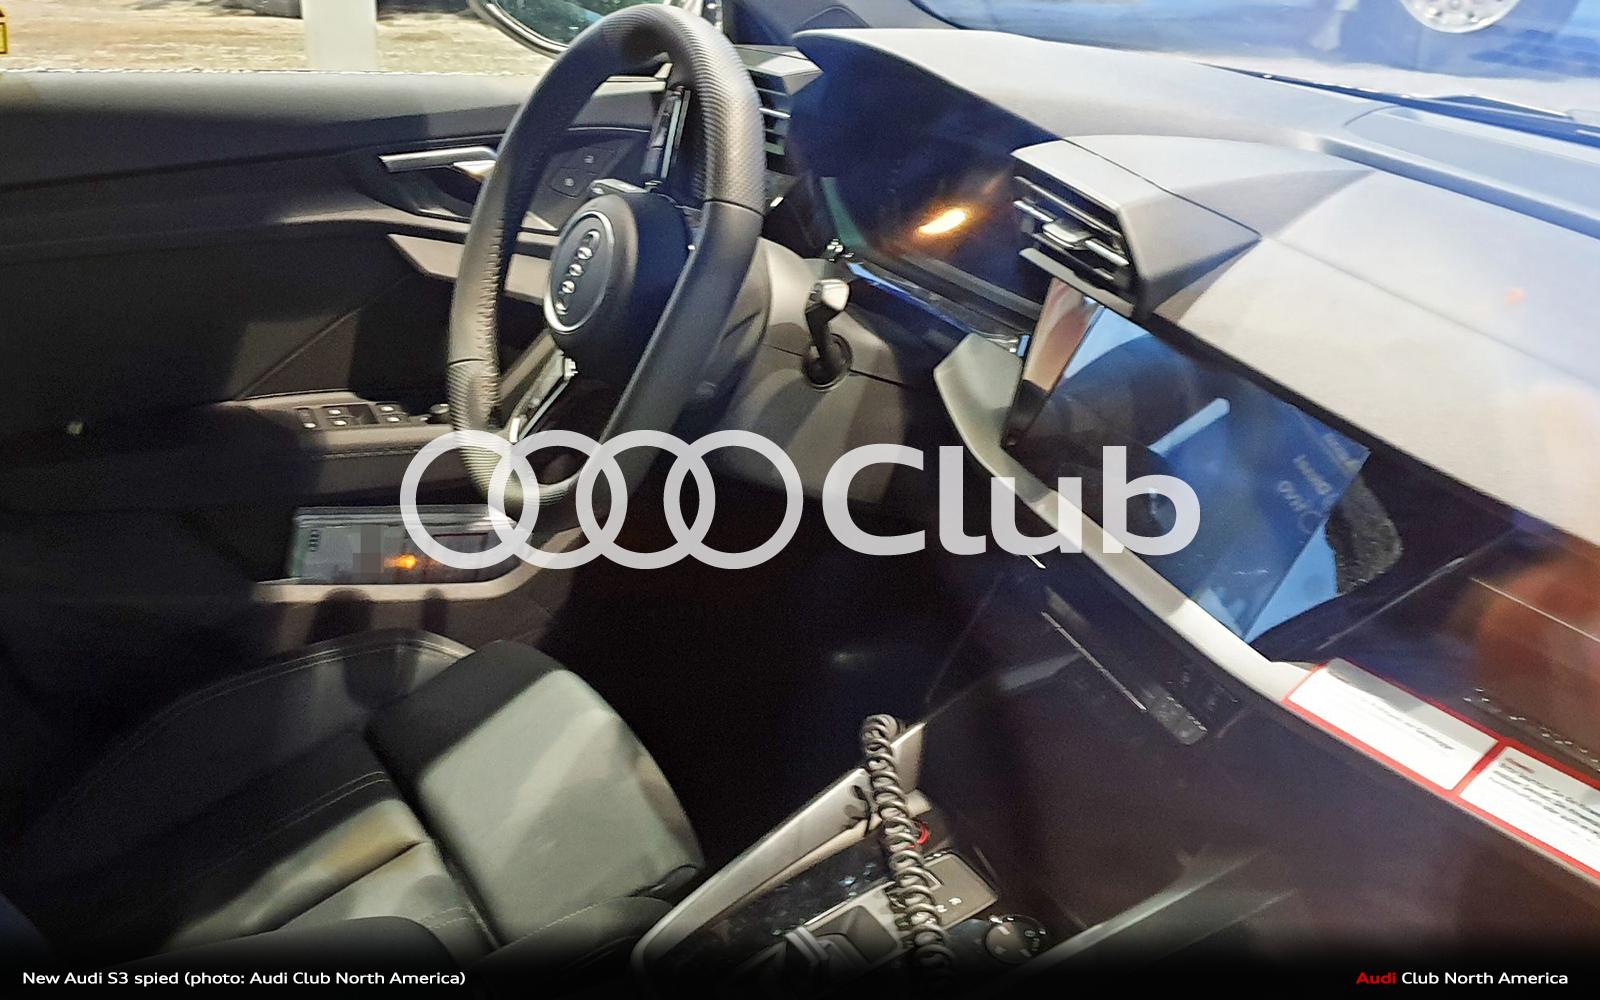 New Audi S3 Interior Spied - Audi Club North America